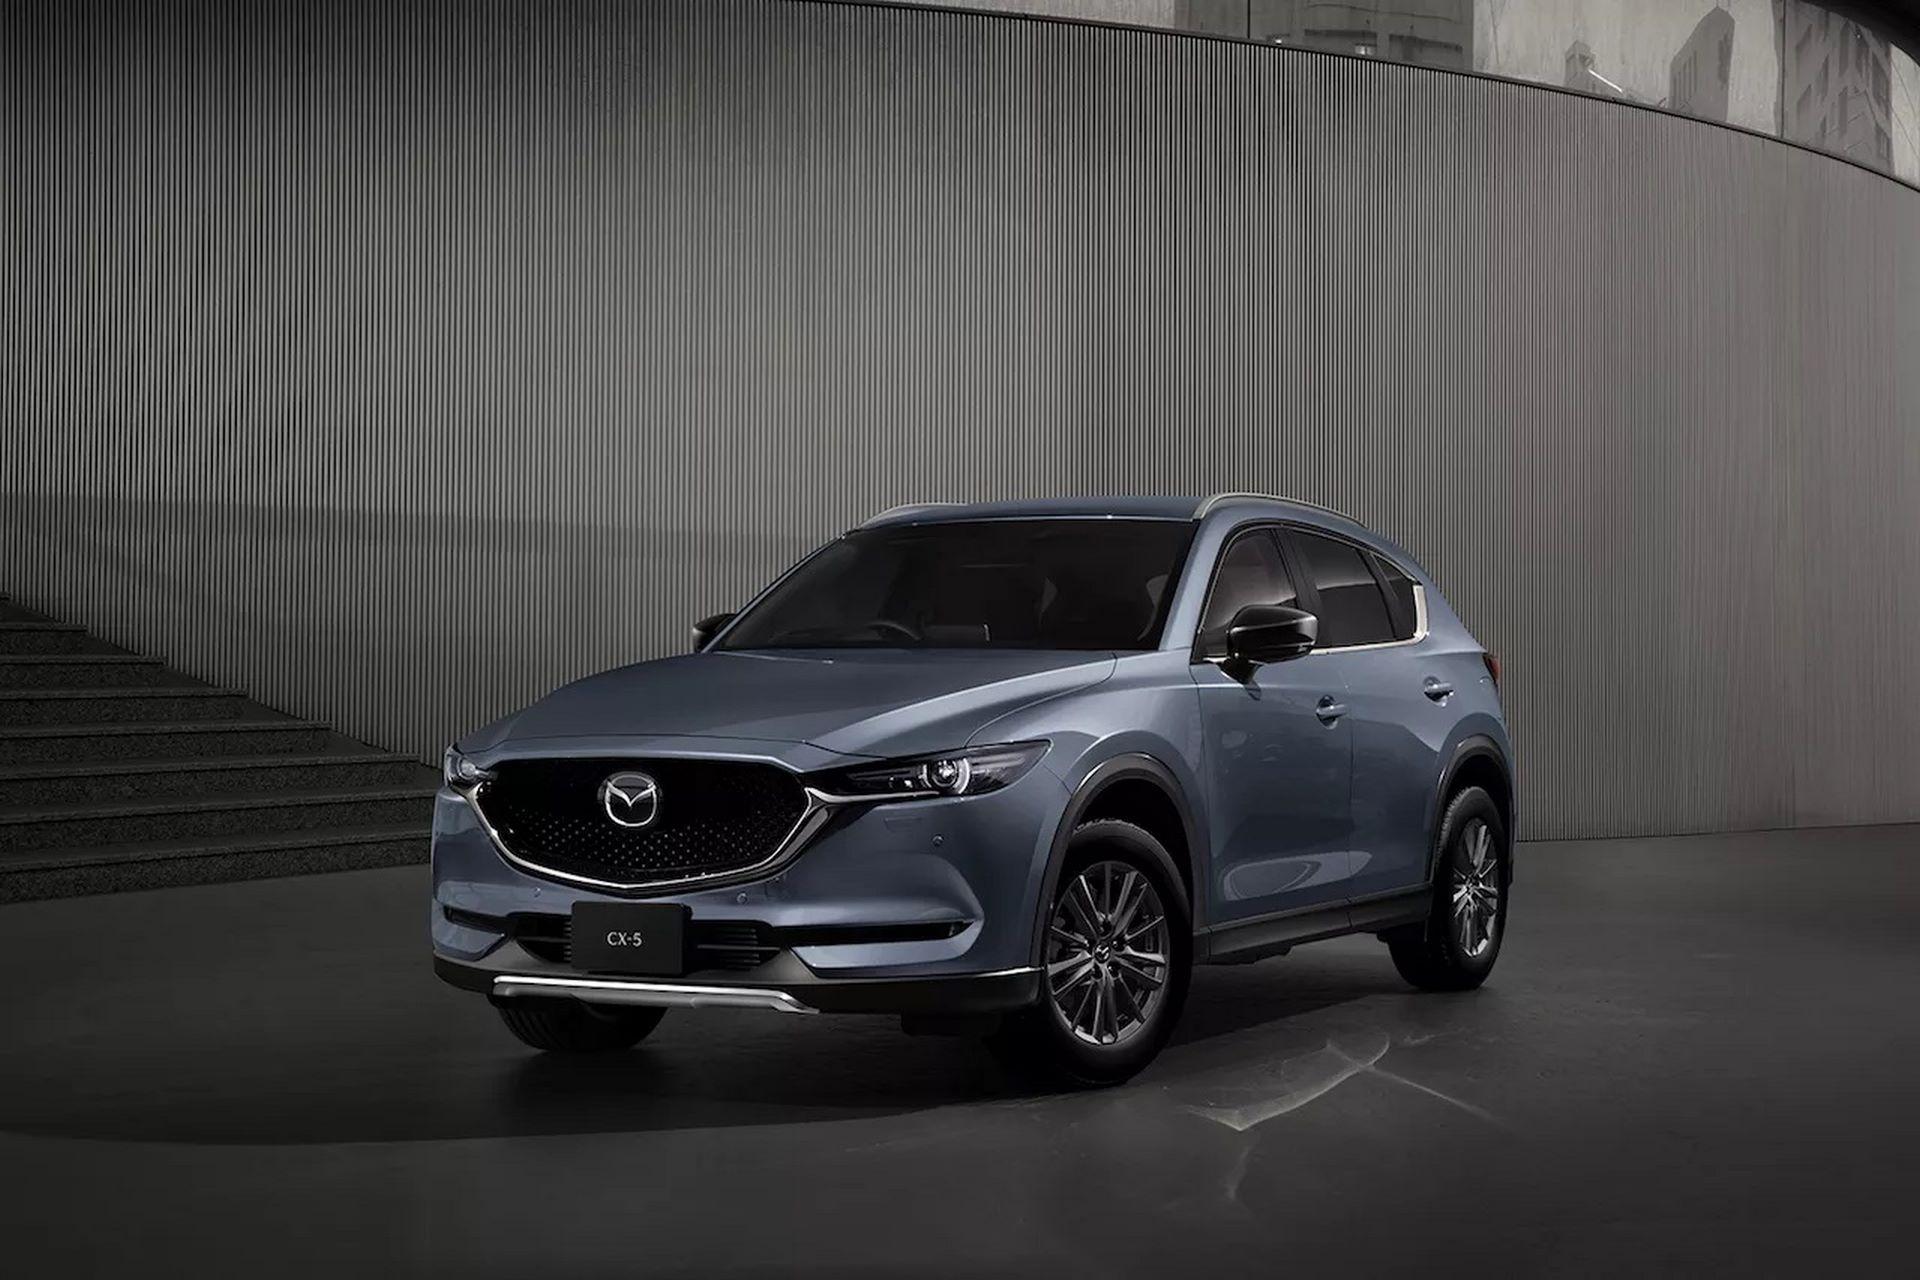 Mazda-MX-5-and-CX-5-2020-16